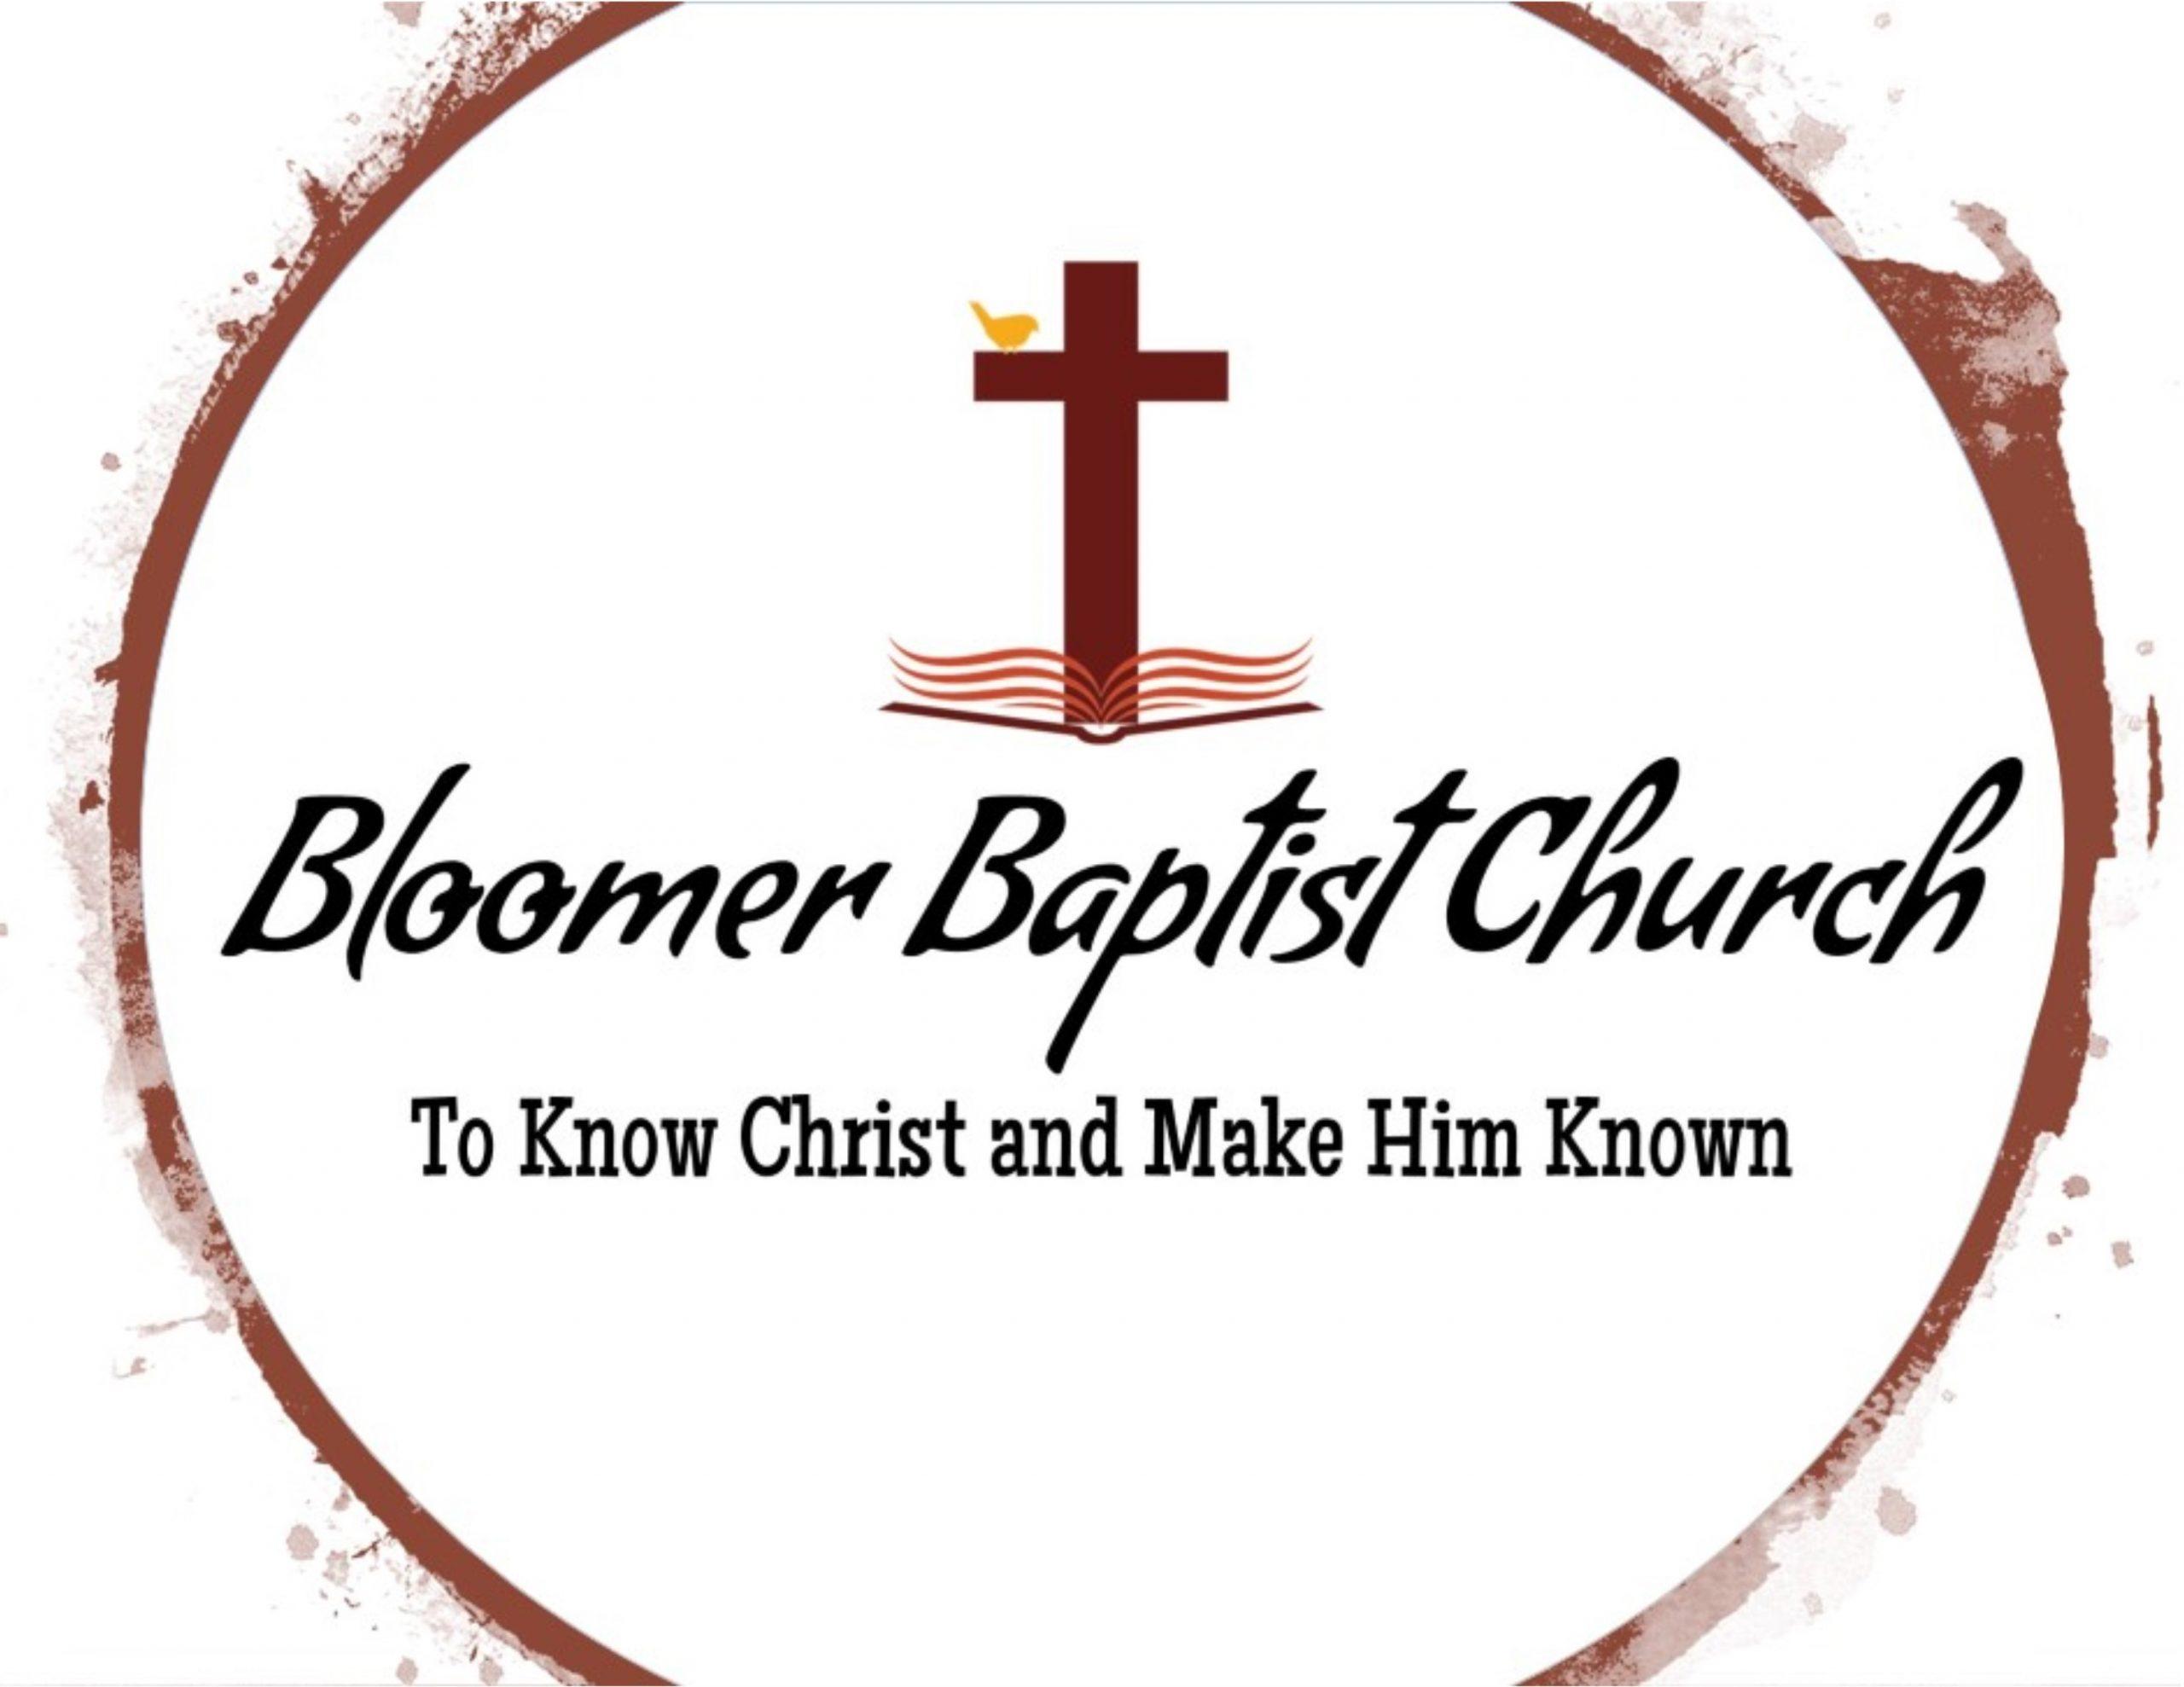 Bloomer Baptist Church